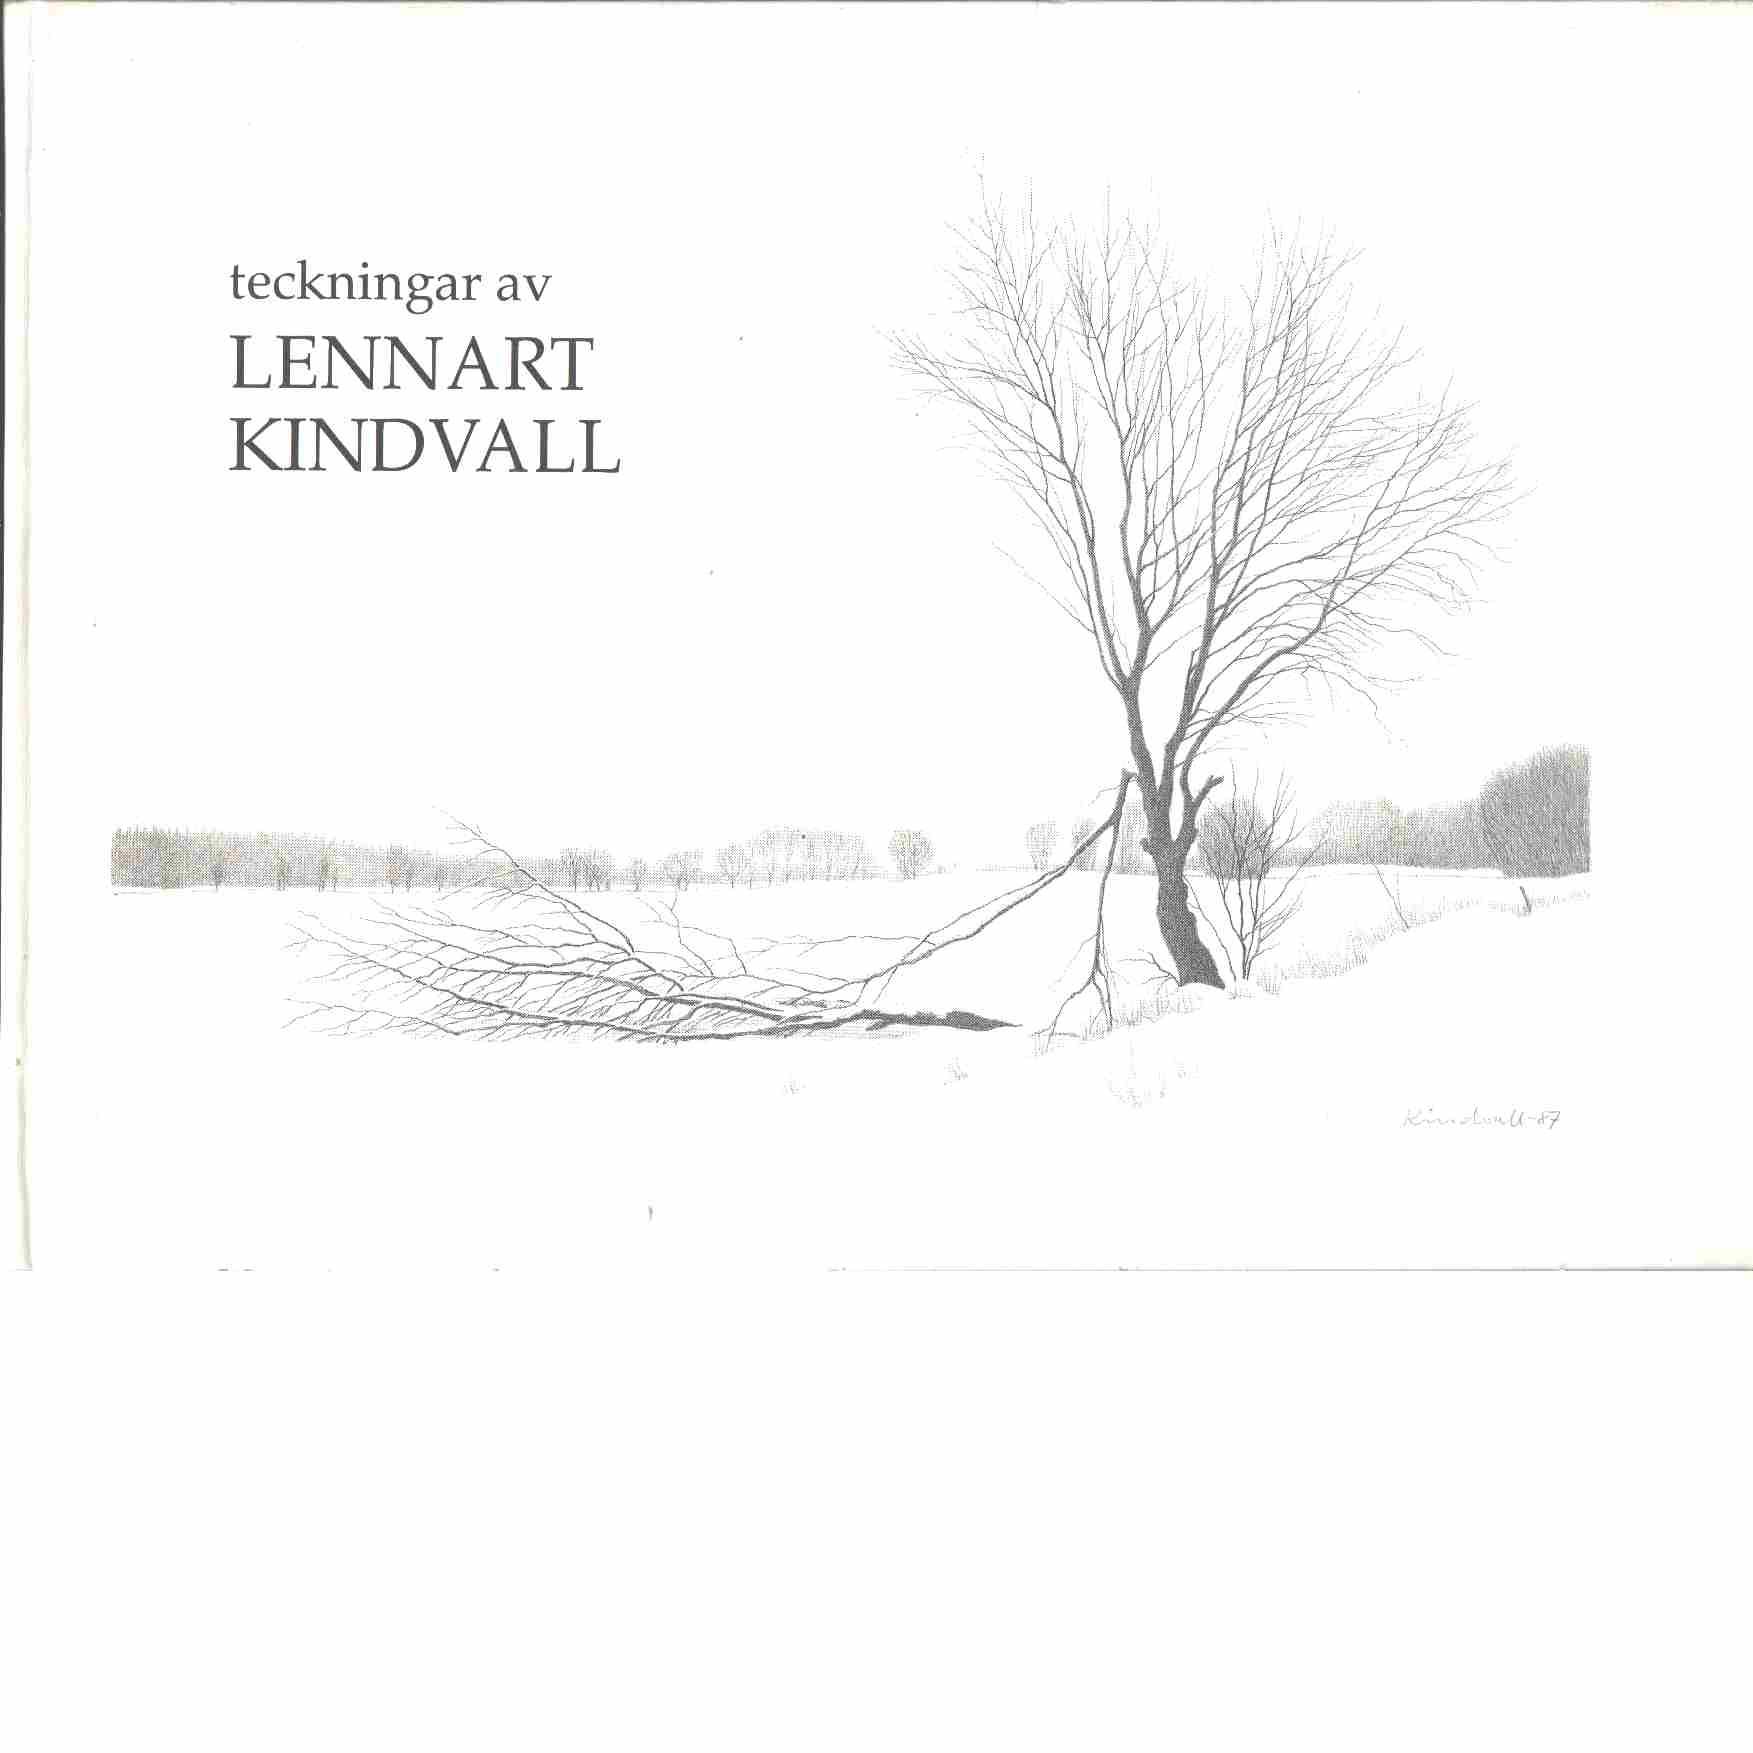 Lennart Kindvall : teckningar - Kindvall, Lennart